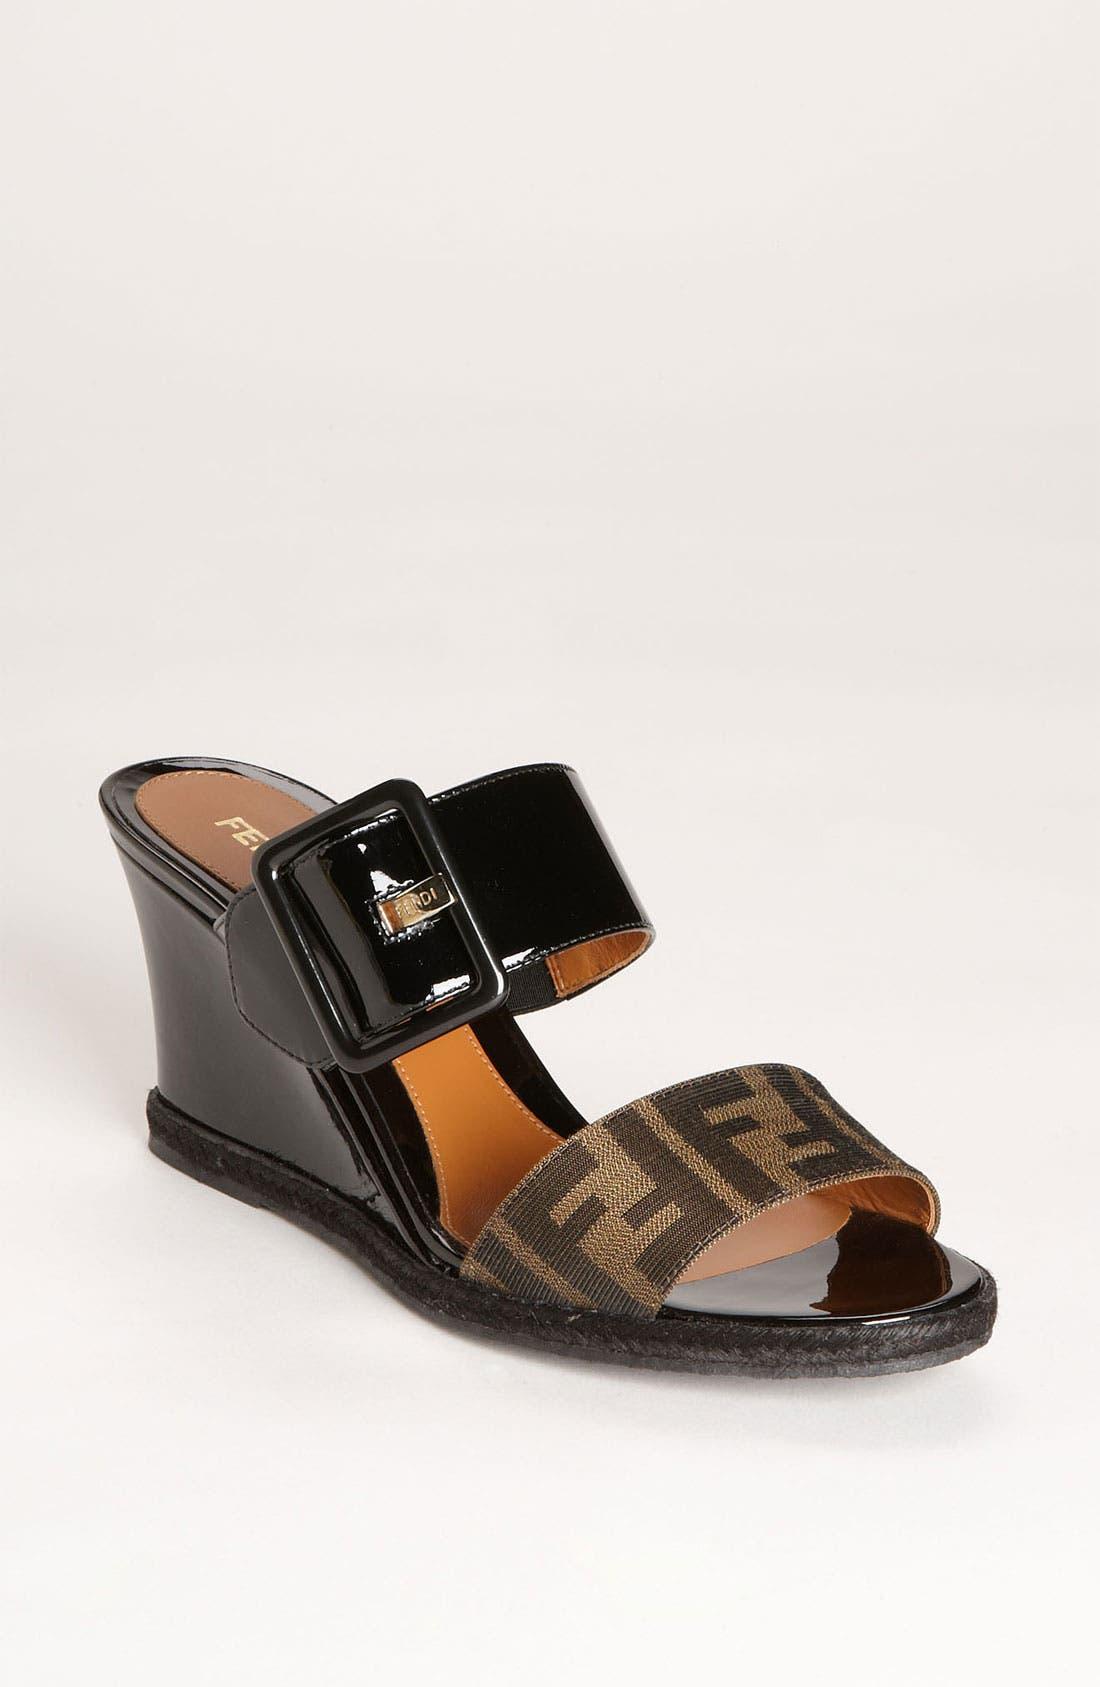 Alternate Image 1 Selected - Fendi 'Vernis' Wedge Sandal (Women)